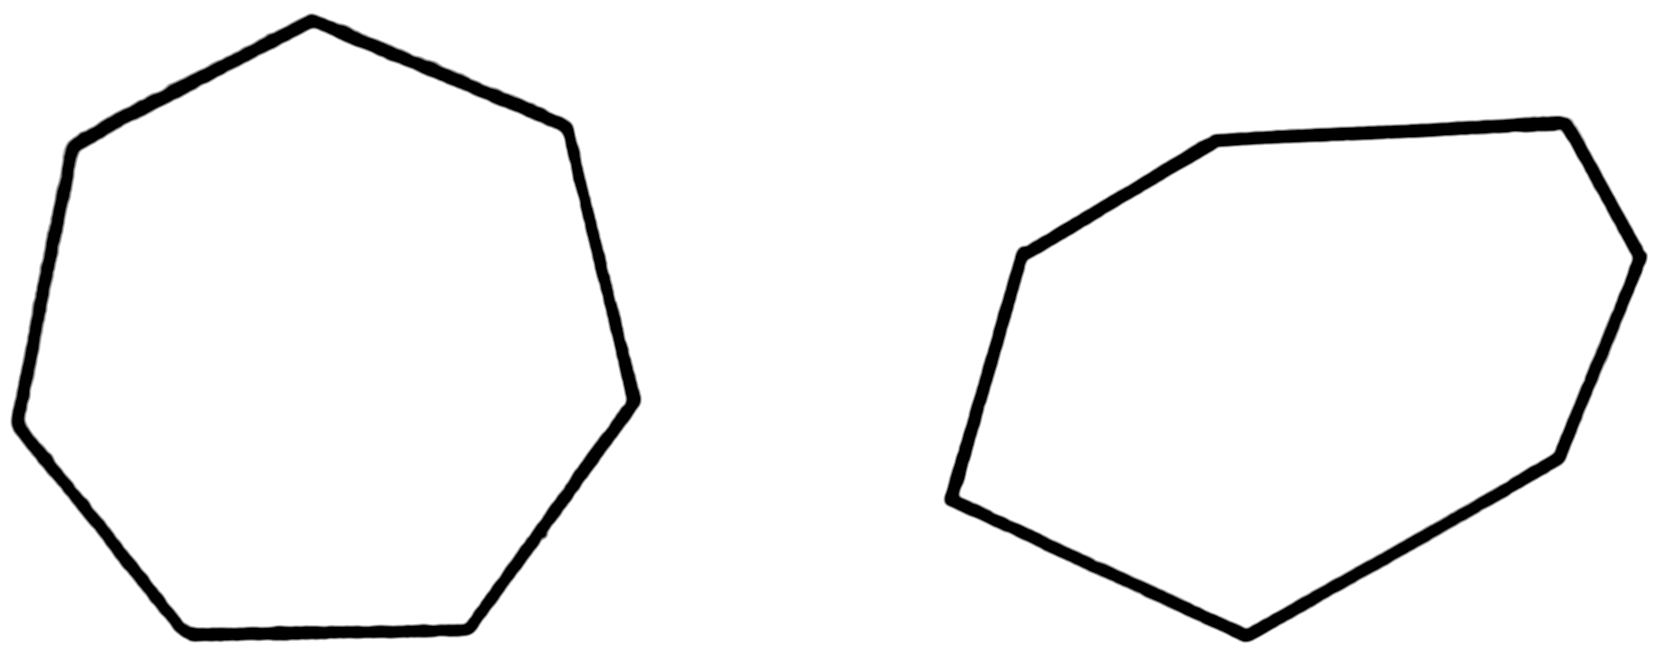 File:Heptagon (PSF).png - Heptagon PNG